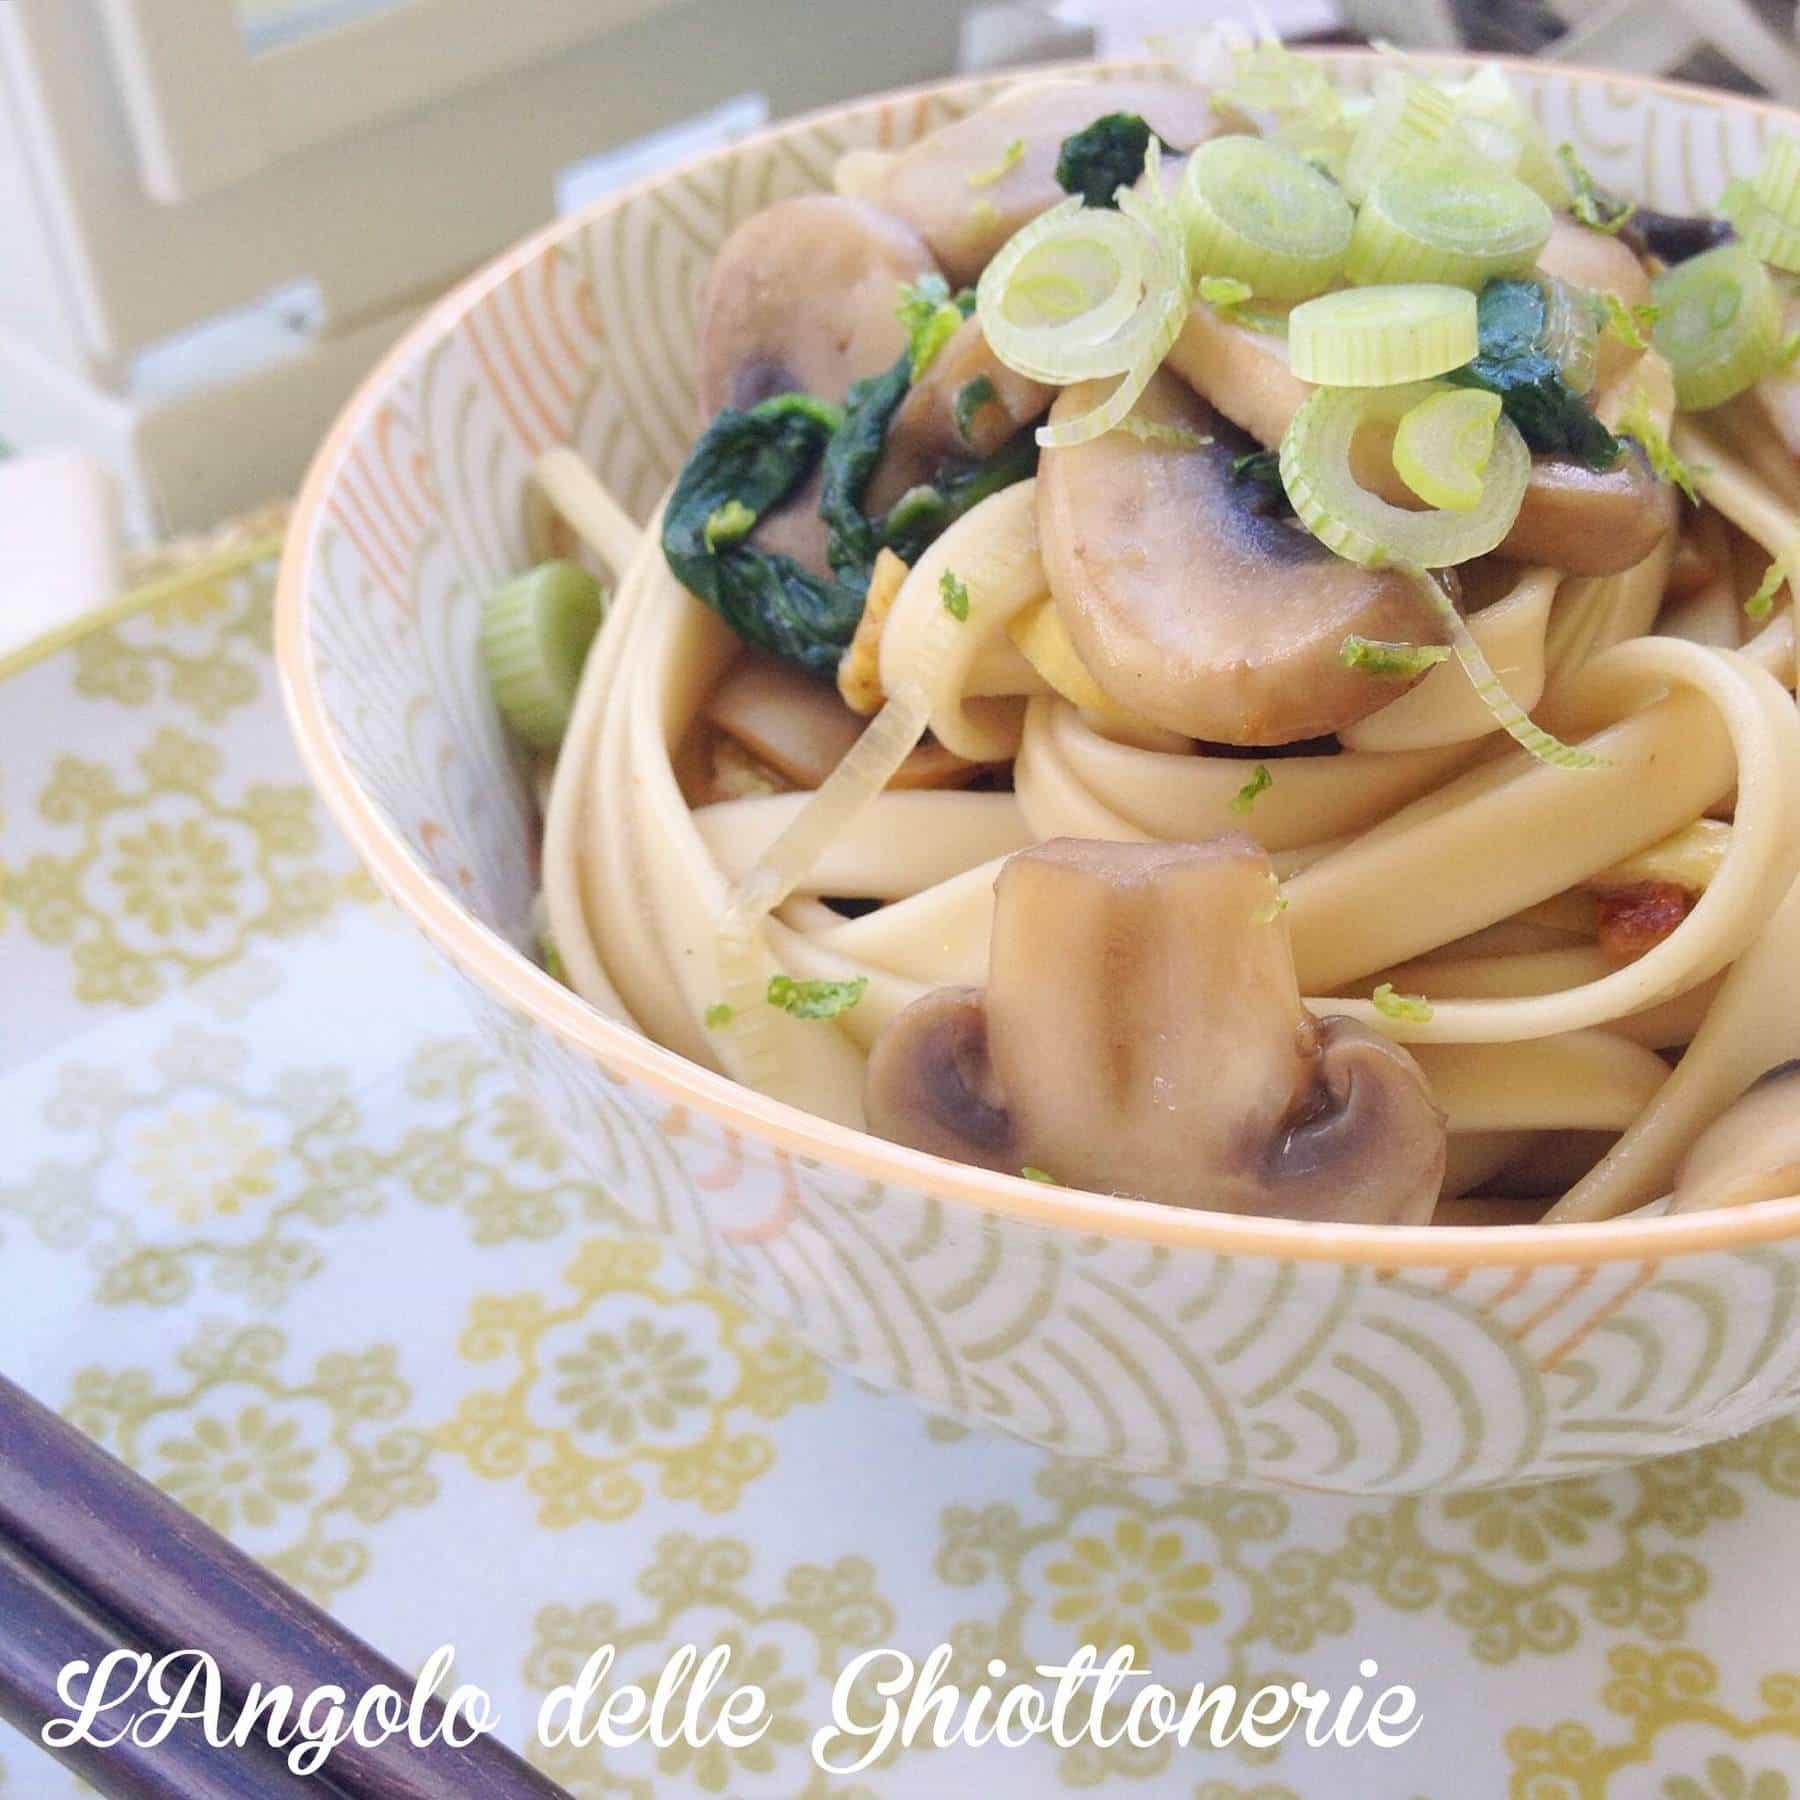 Veggie udon con frittatina, spinaci novelli, funghi